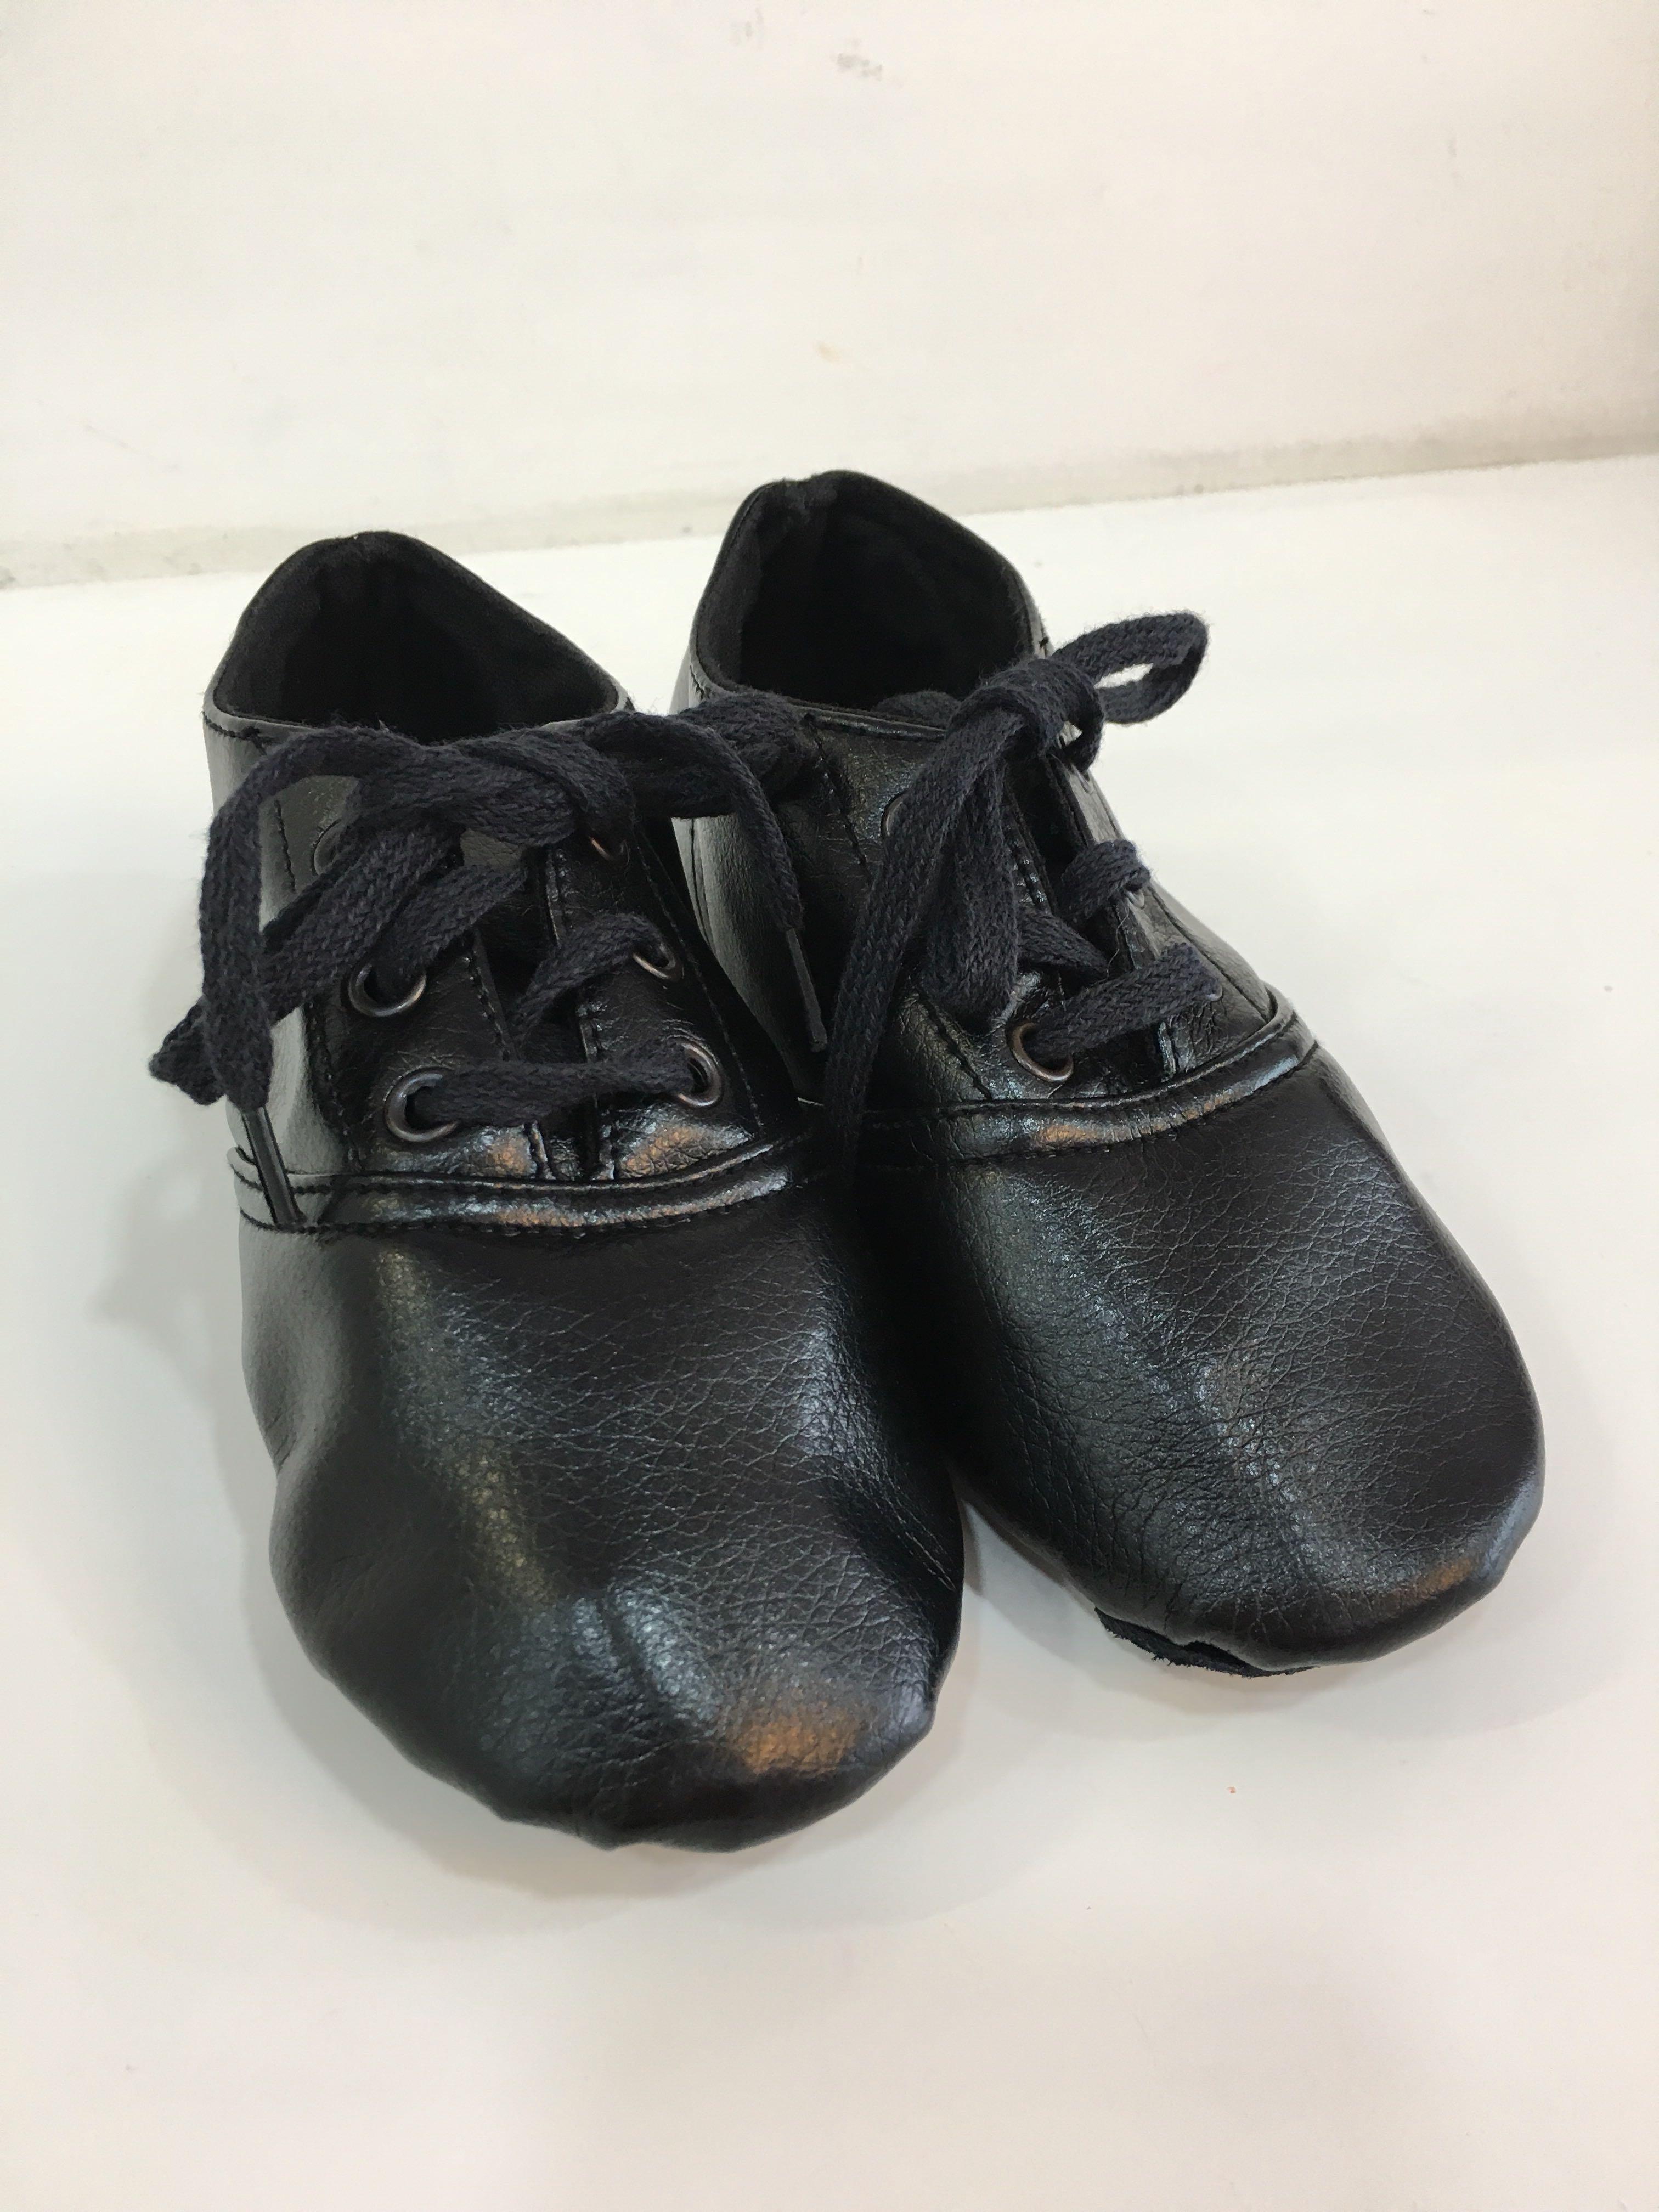 best wholesaler best sneakers discount Jazz Shoes for boy 男童爵士鞋size 28, Babies & Kids, Boys' Apparel ...